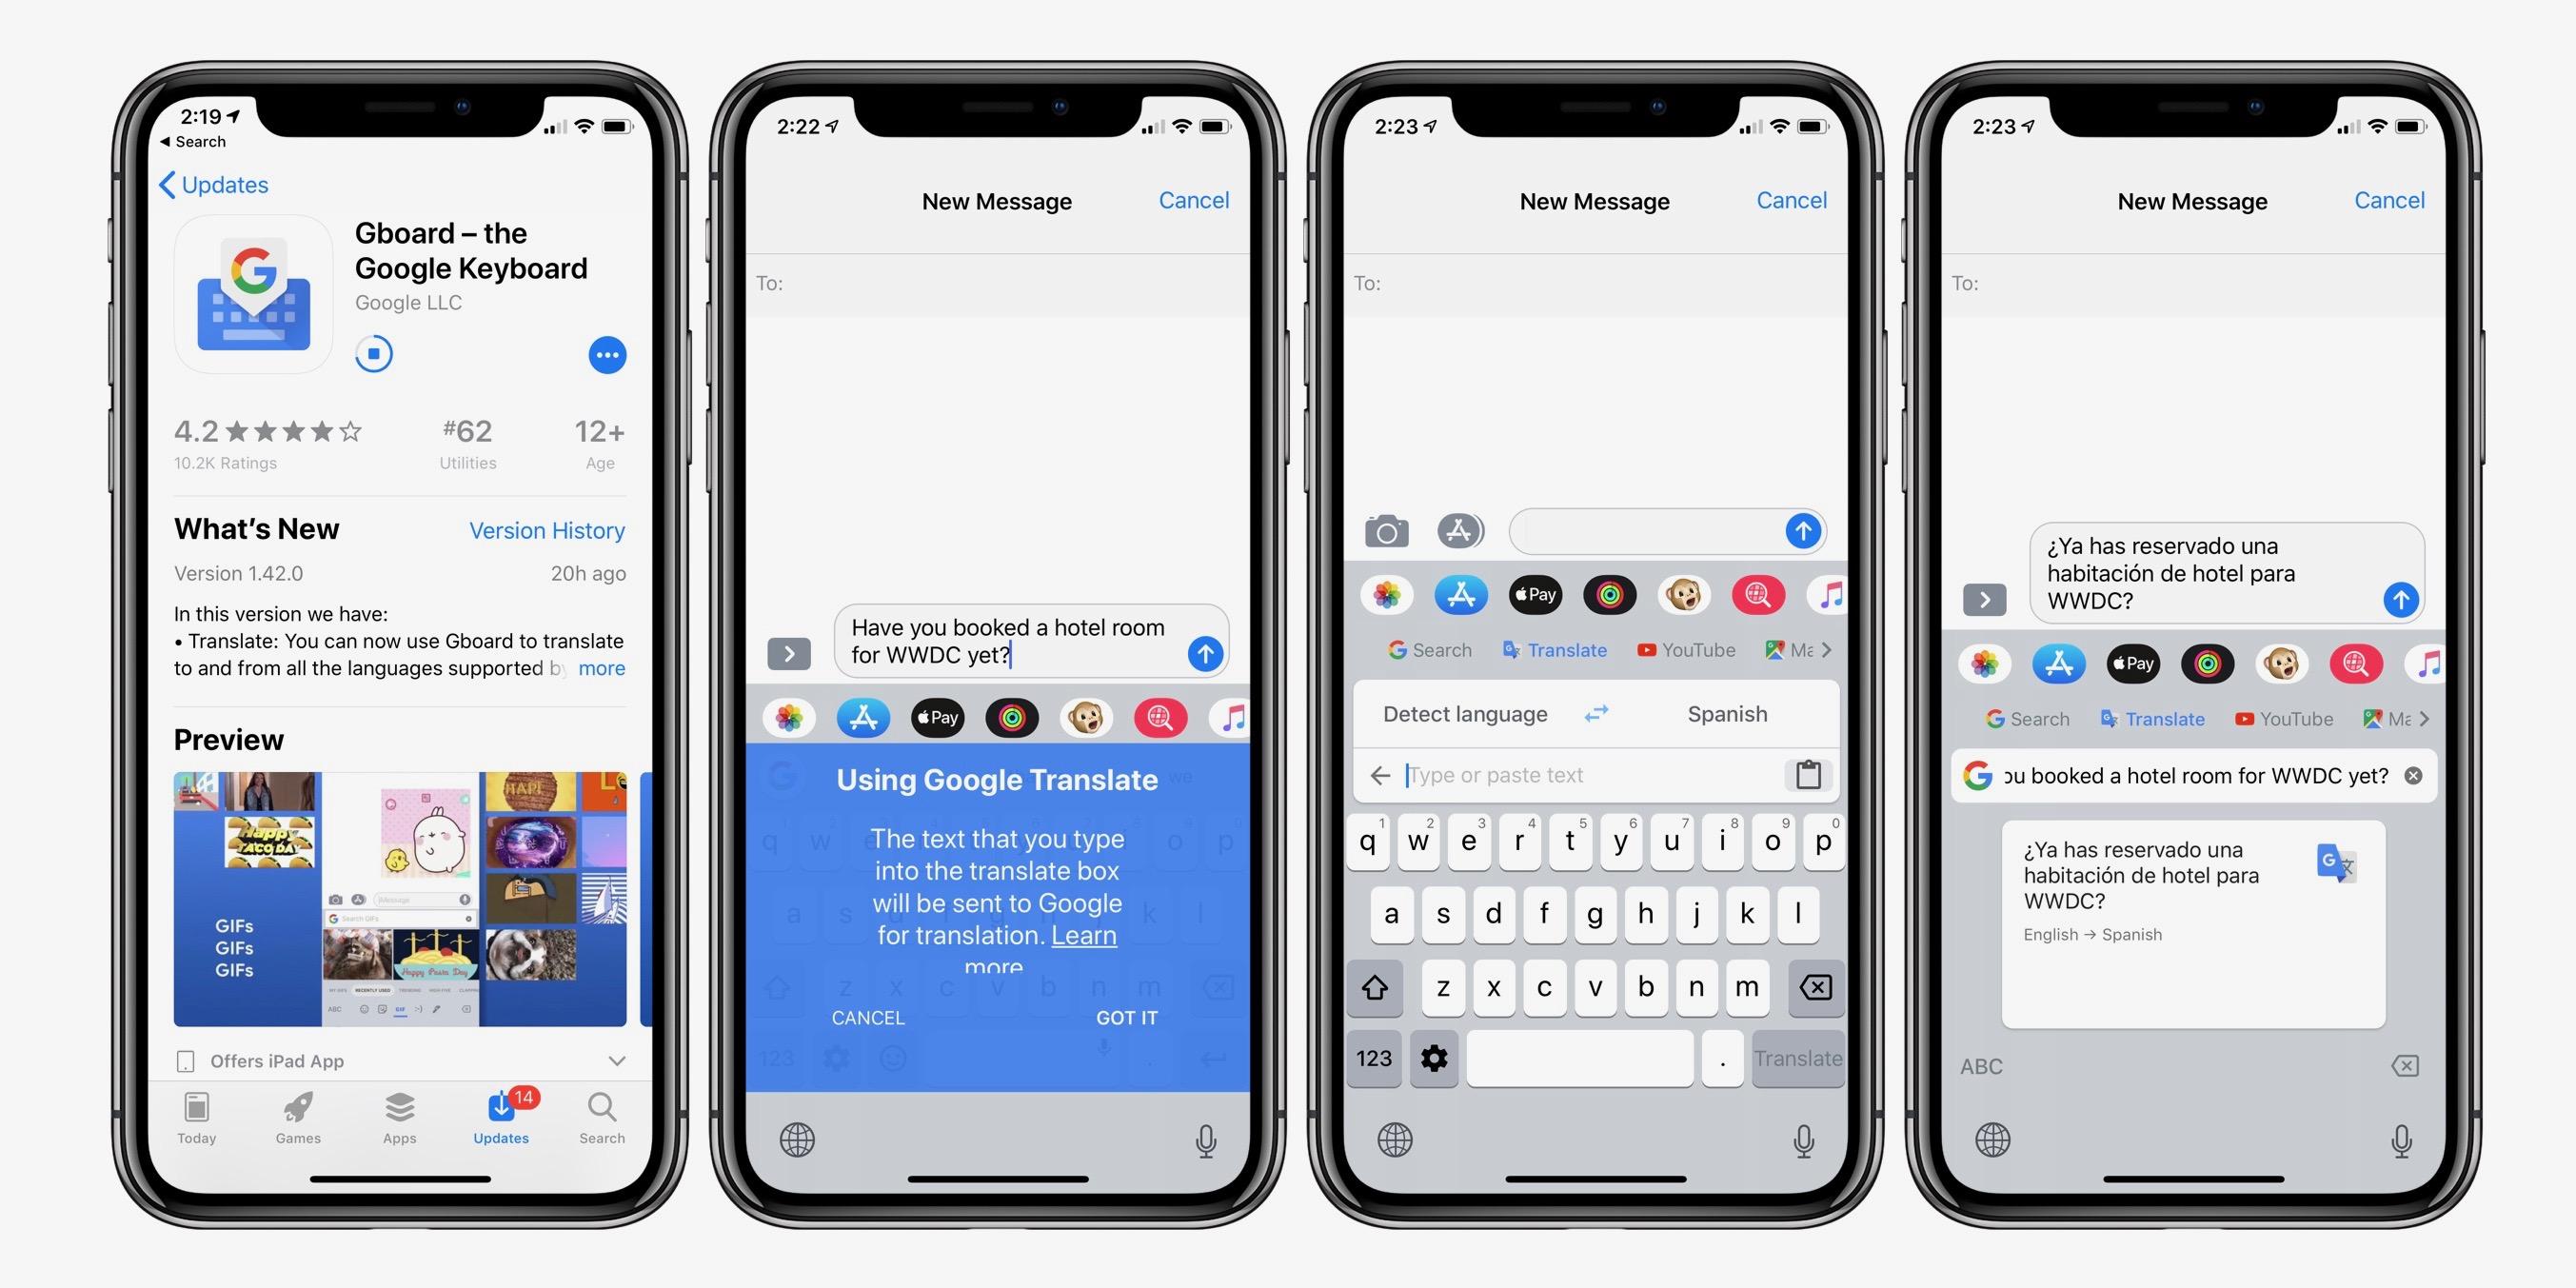 Gboard iOS keyboard update brings handy translate feature to iPhone and iPad